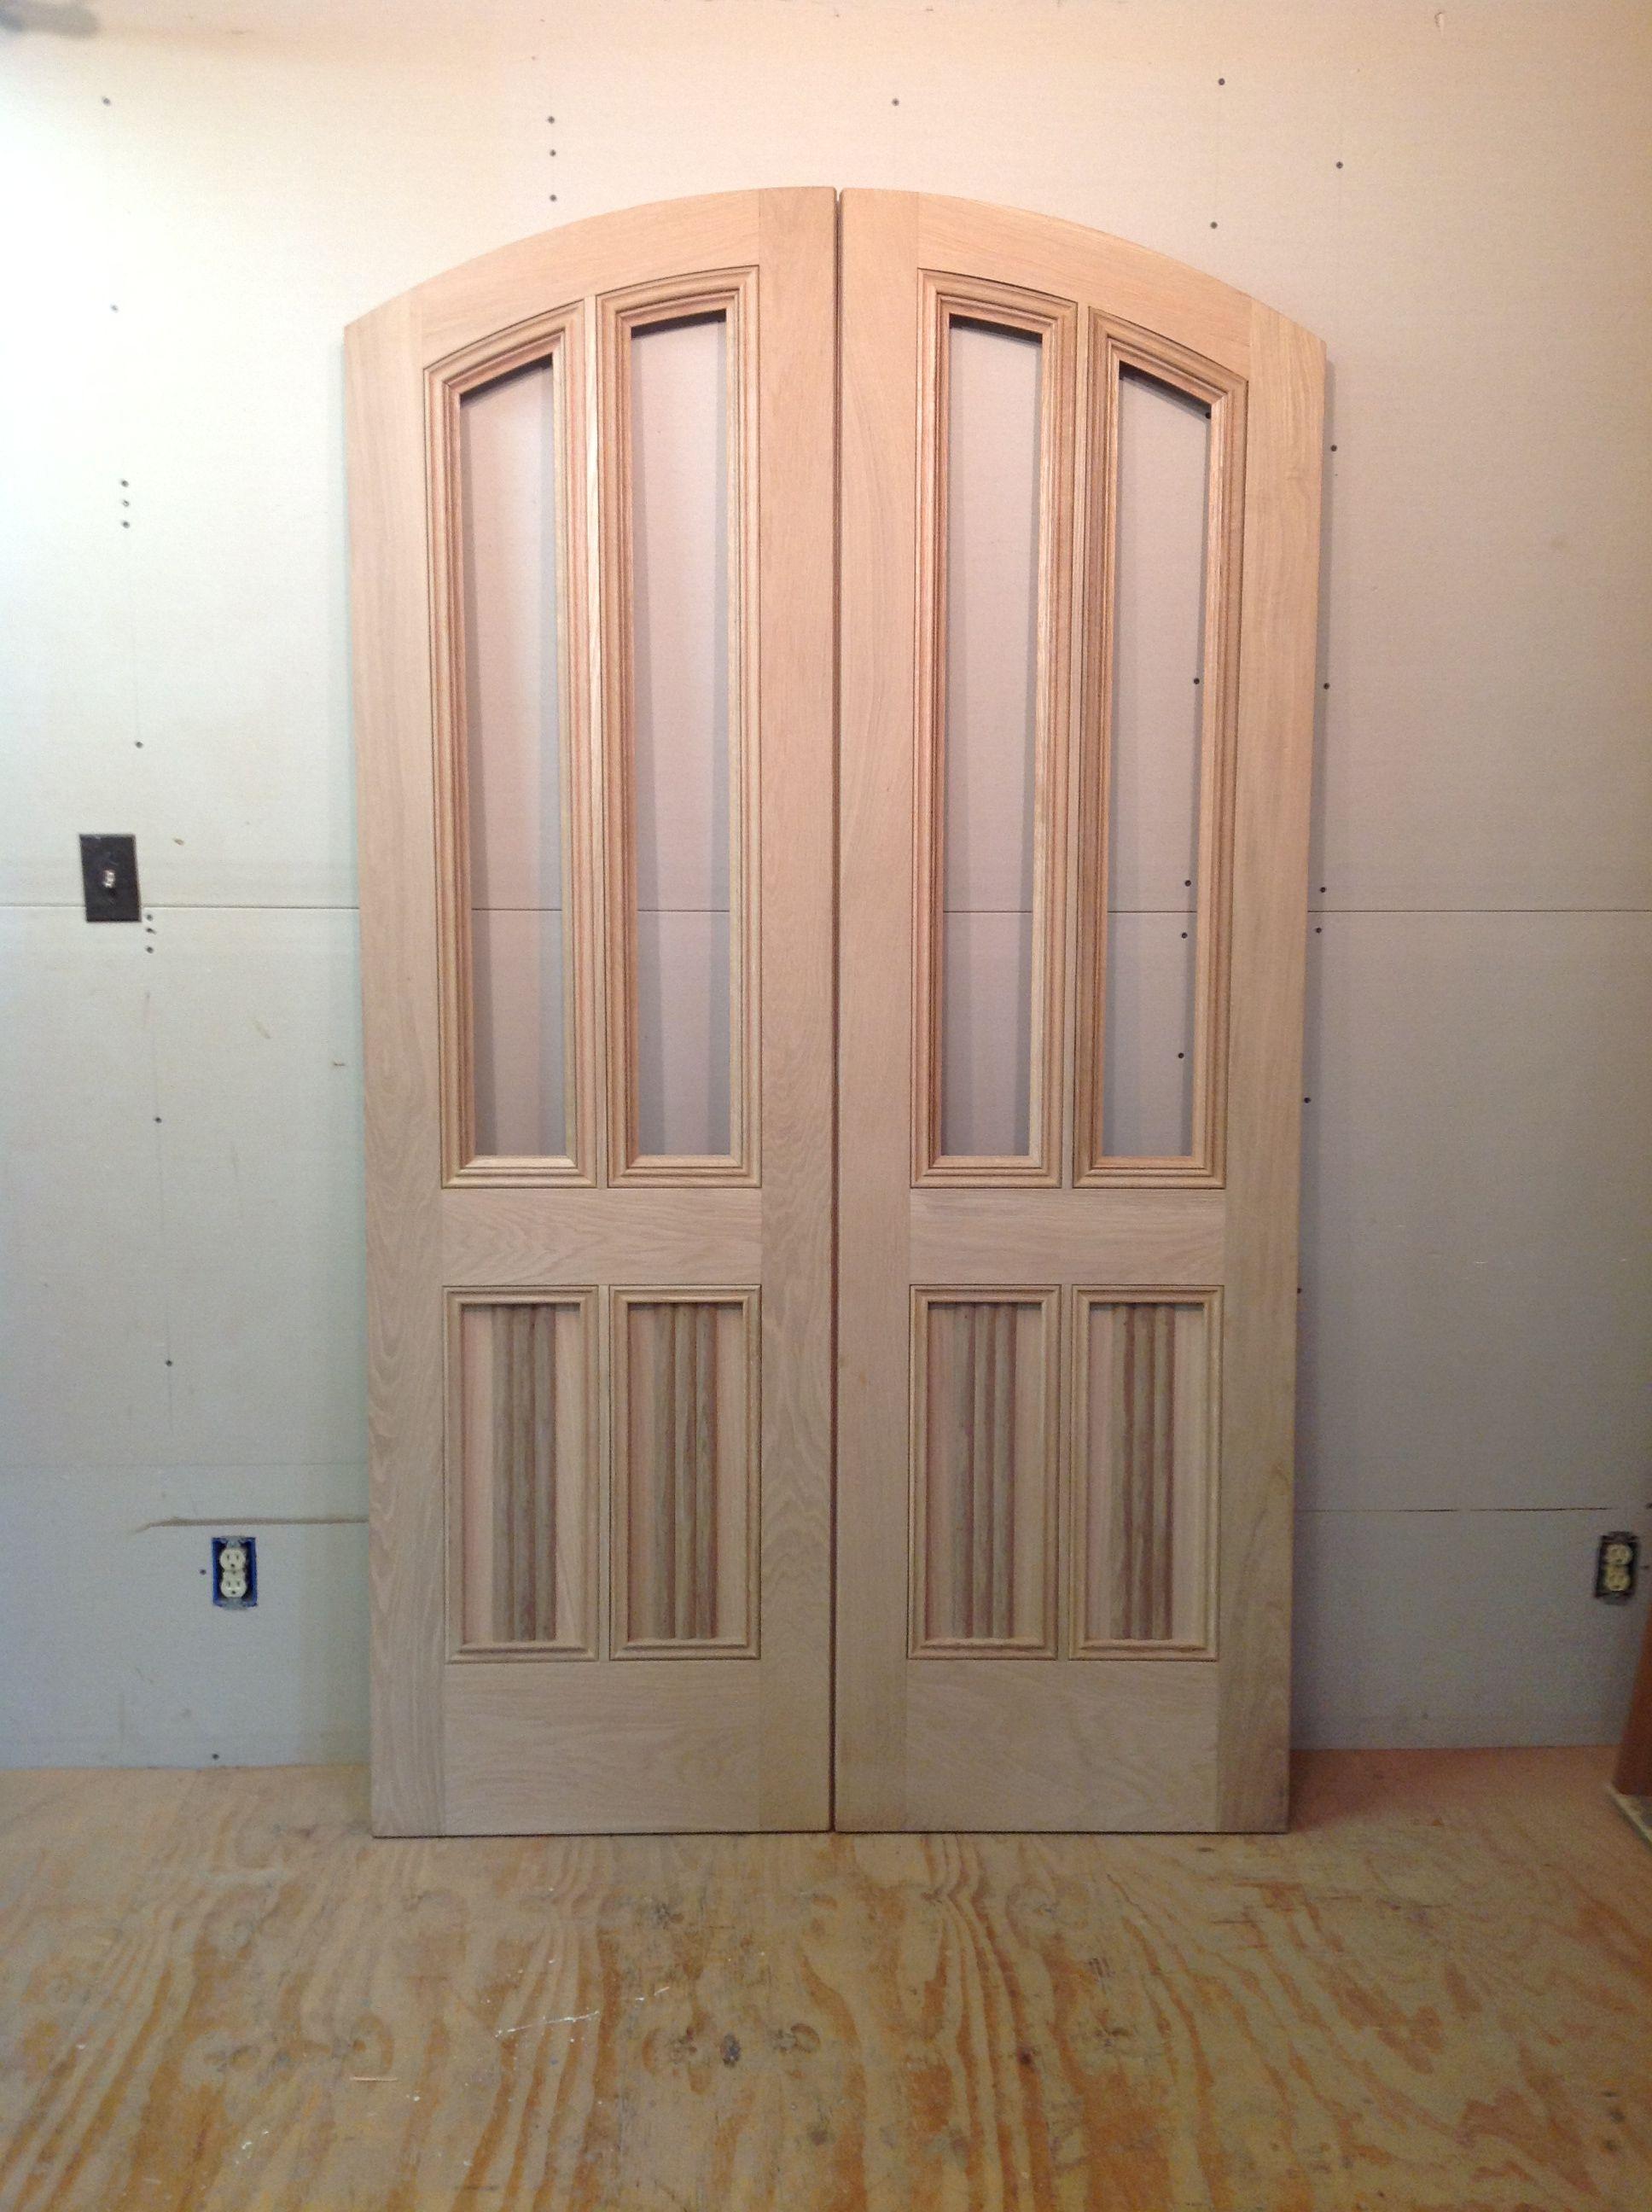 2592 #915C3A Wood Custom Entryway Doors – Jim Illingworth Millwork LLC wallpaper Radius Top Entry Doors 38951936